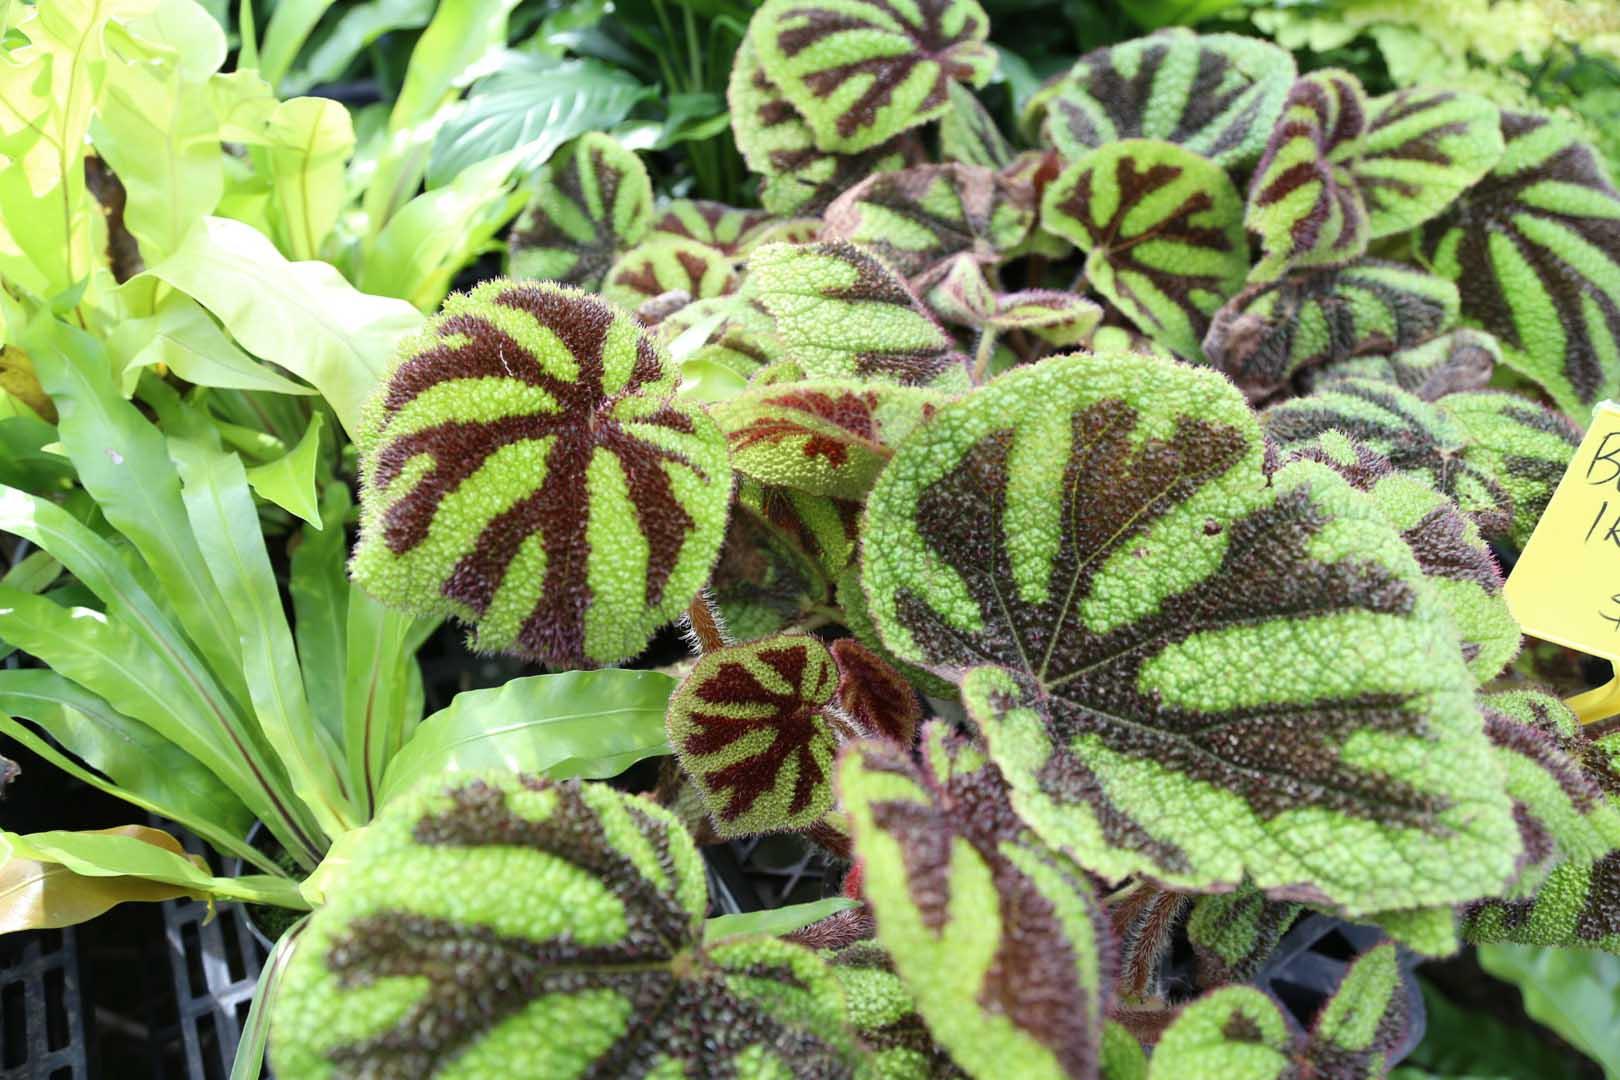 Begonia 'Iron Cross' looking stunning